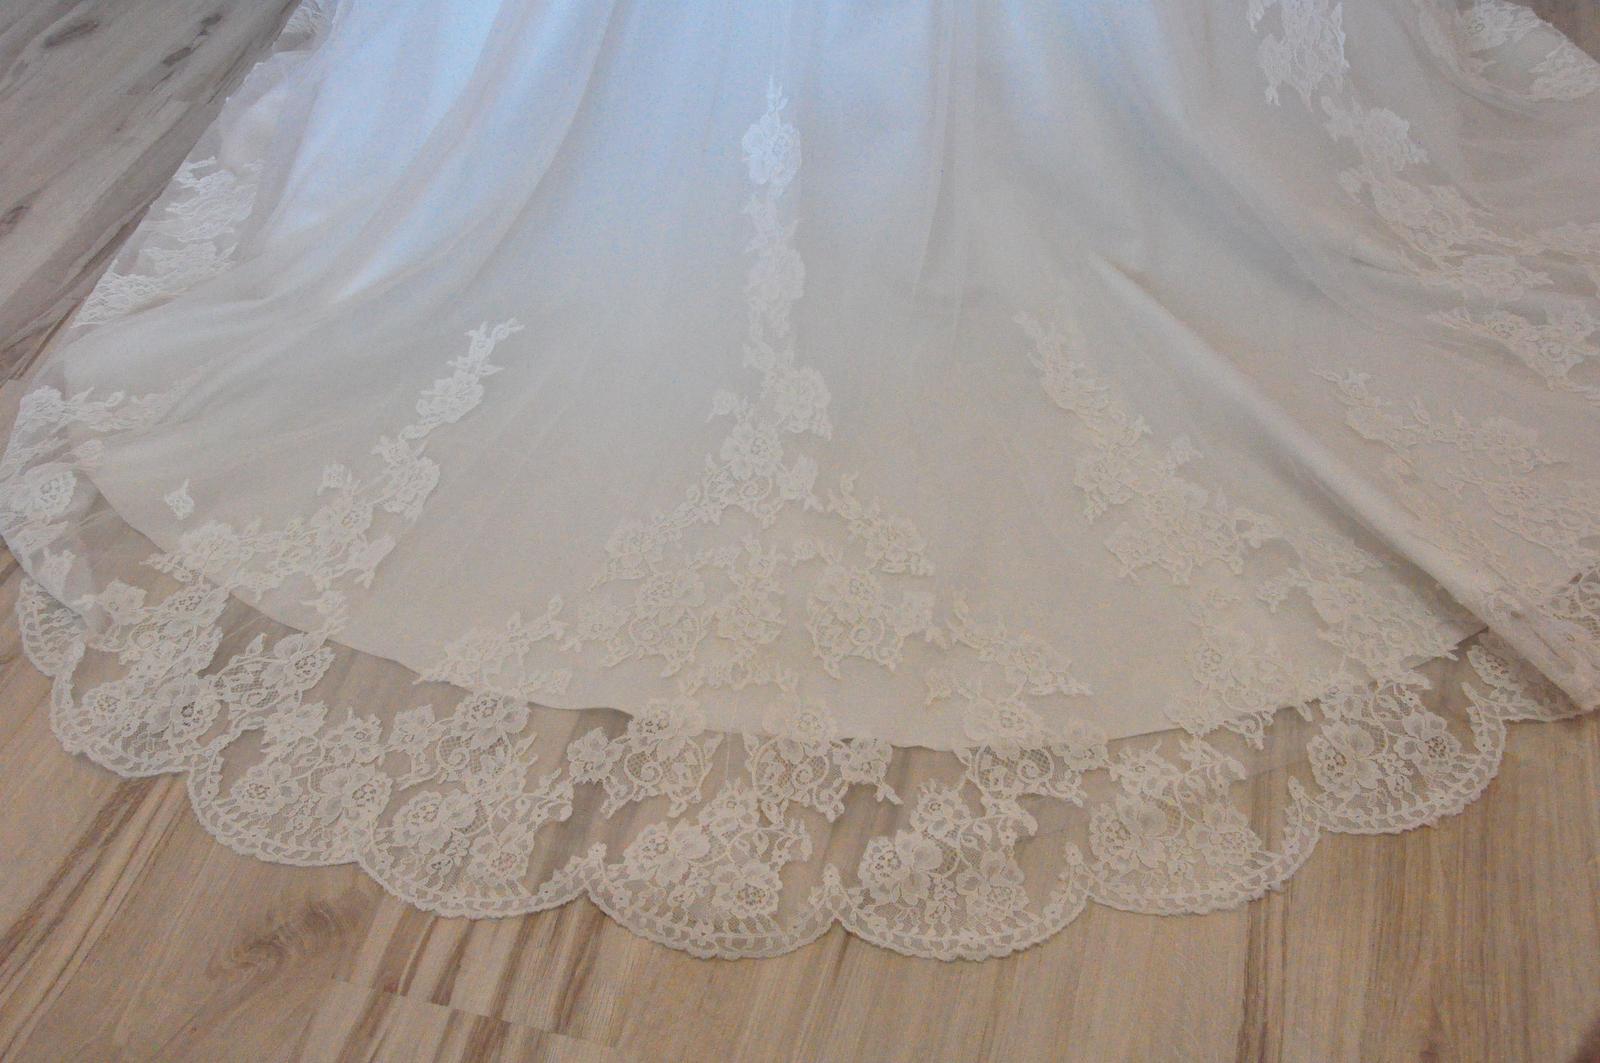 Svadobné šaty Maggie Sottero Willow - Obrázok č. 4